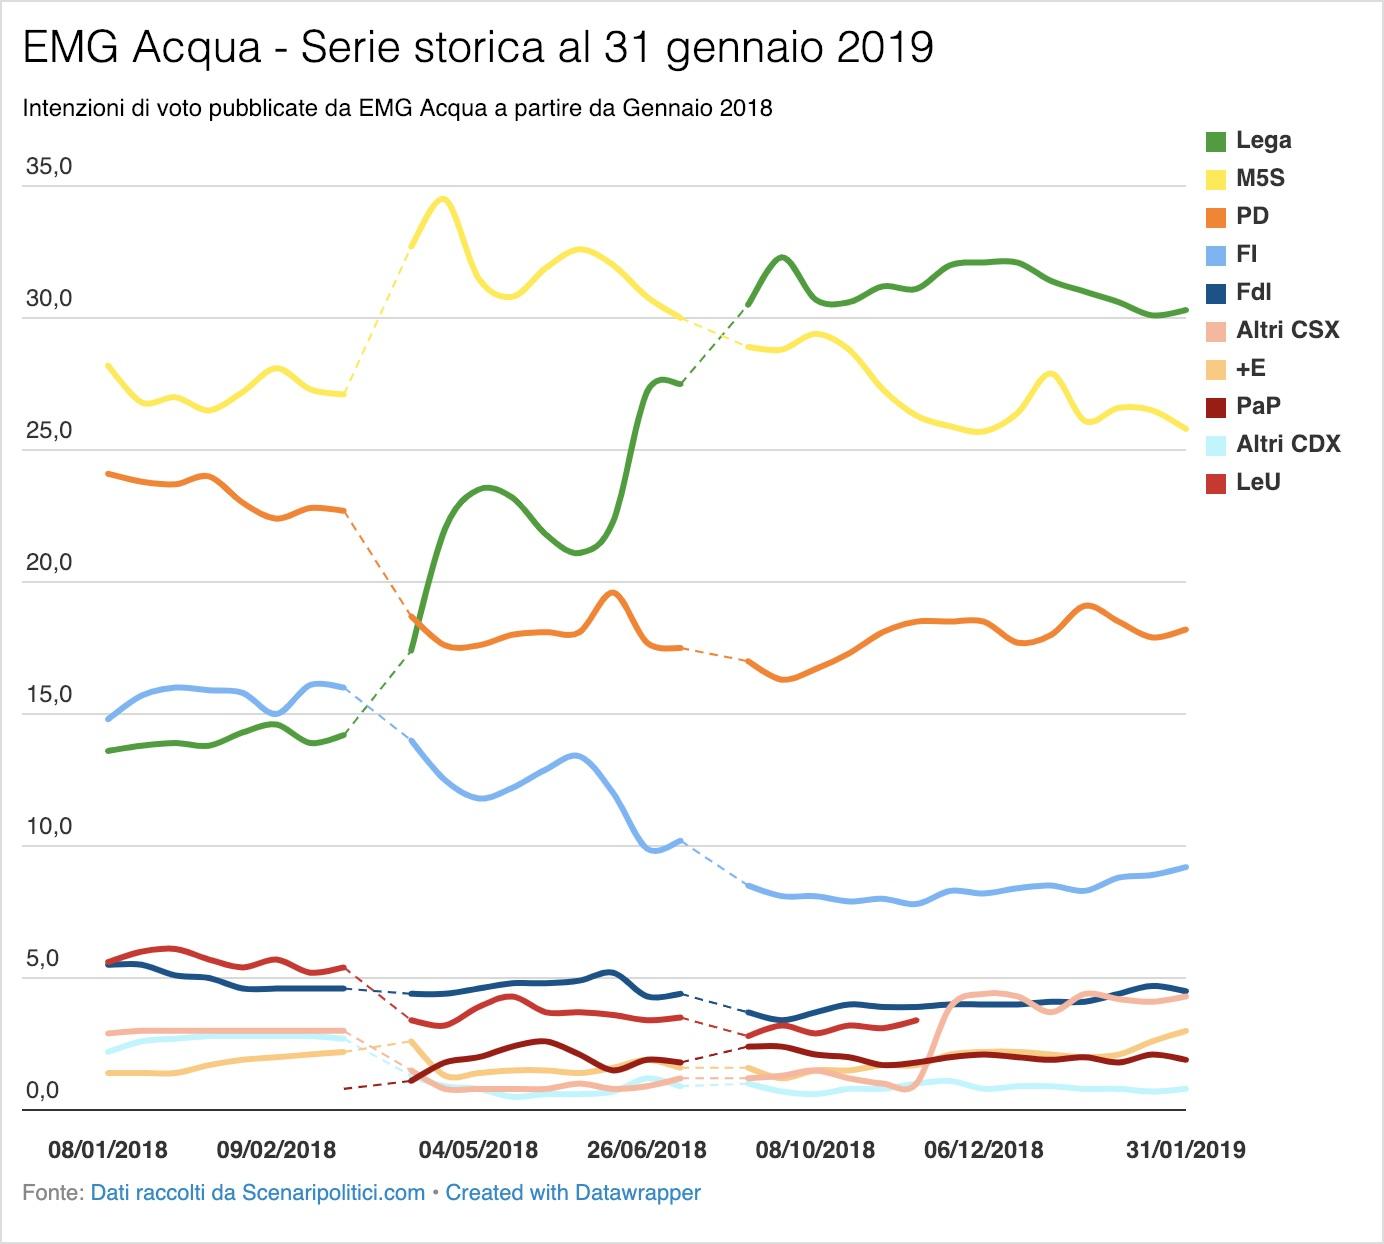 Sondaggio EMG Acqua 31 gennaio 2019